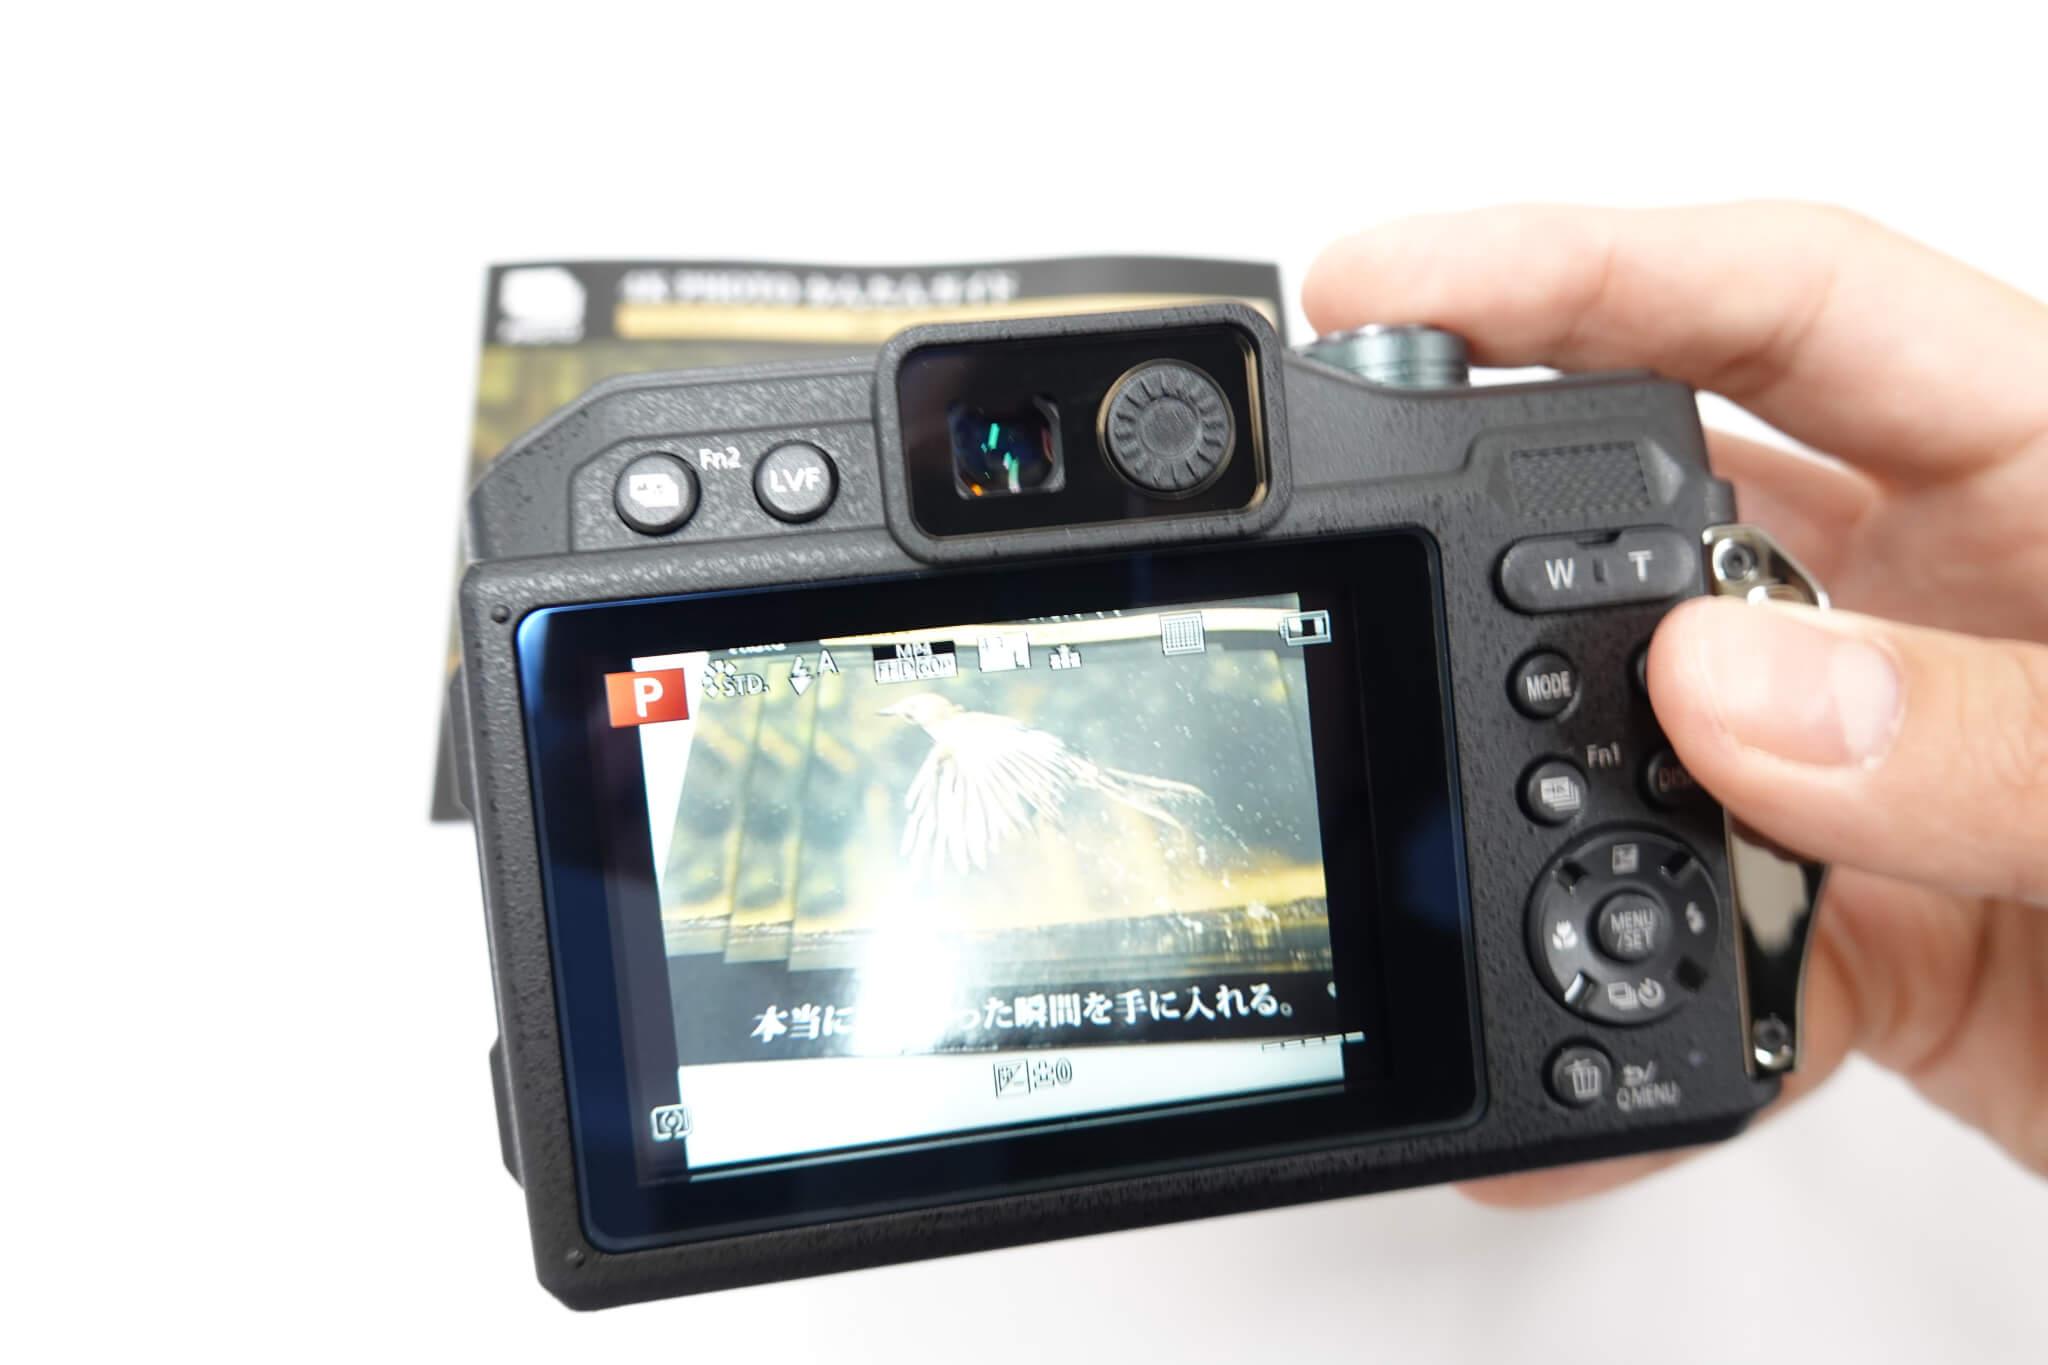 LUMIX DC-FT7 カメラの電源を入れて撮影